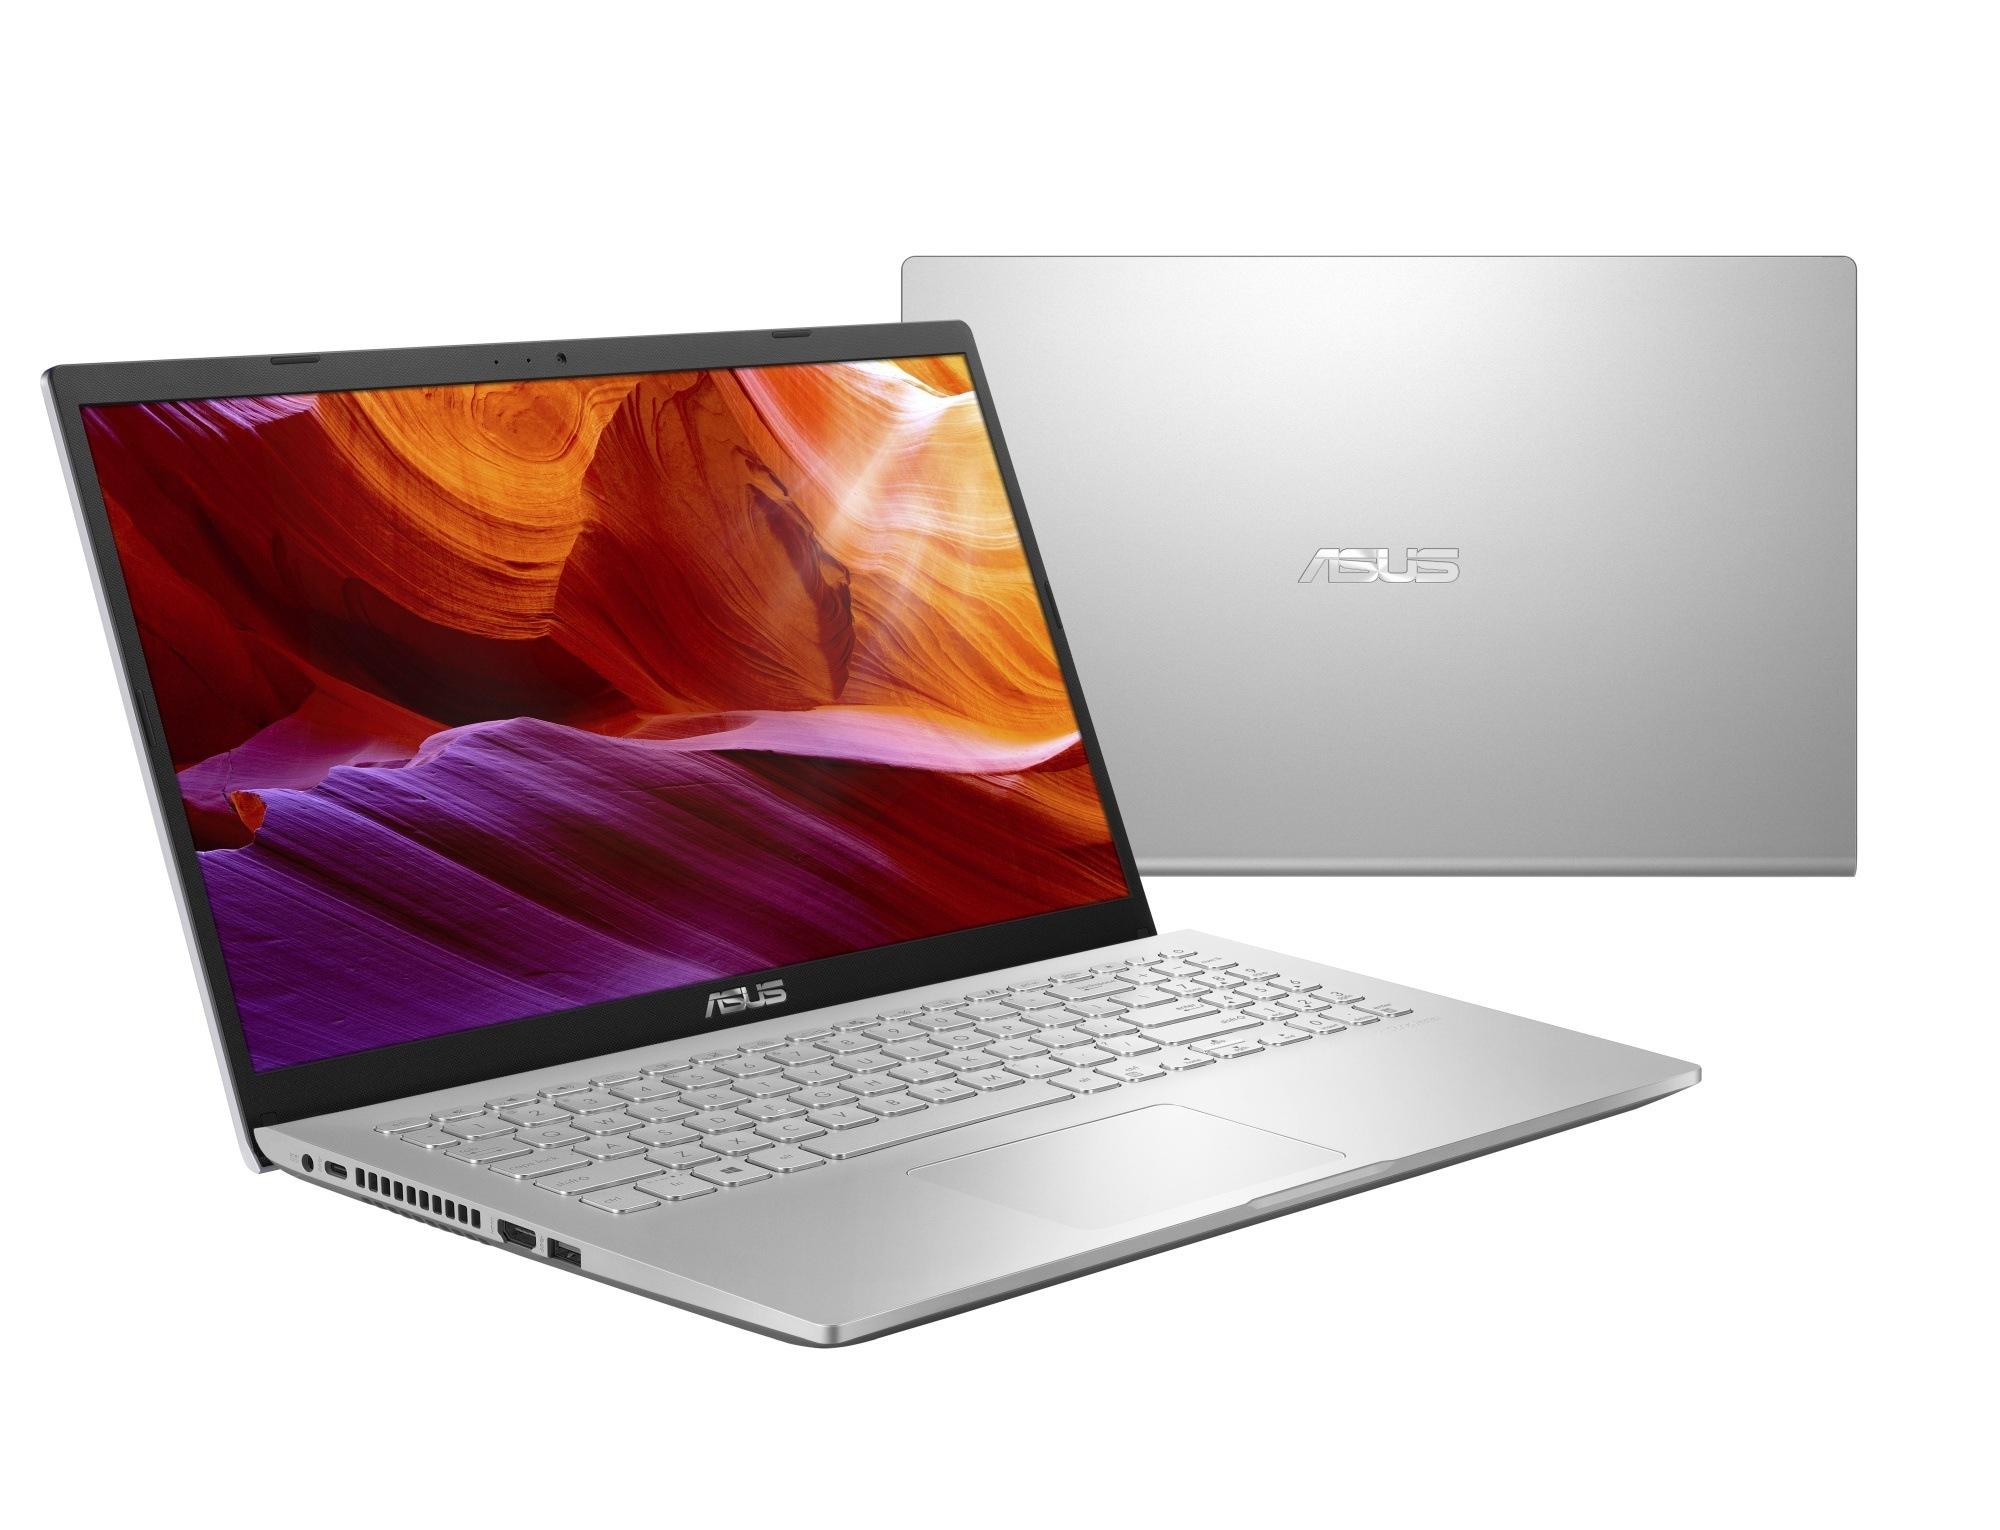 asus-laptop-x509ja-wb311-prenosni-racunalnik-lap-top-aliansa-si-2.jpeg